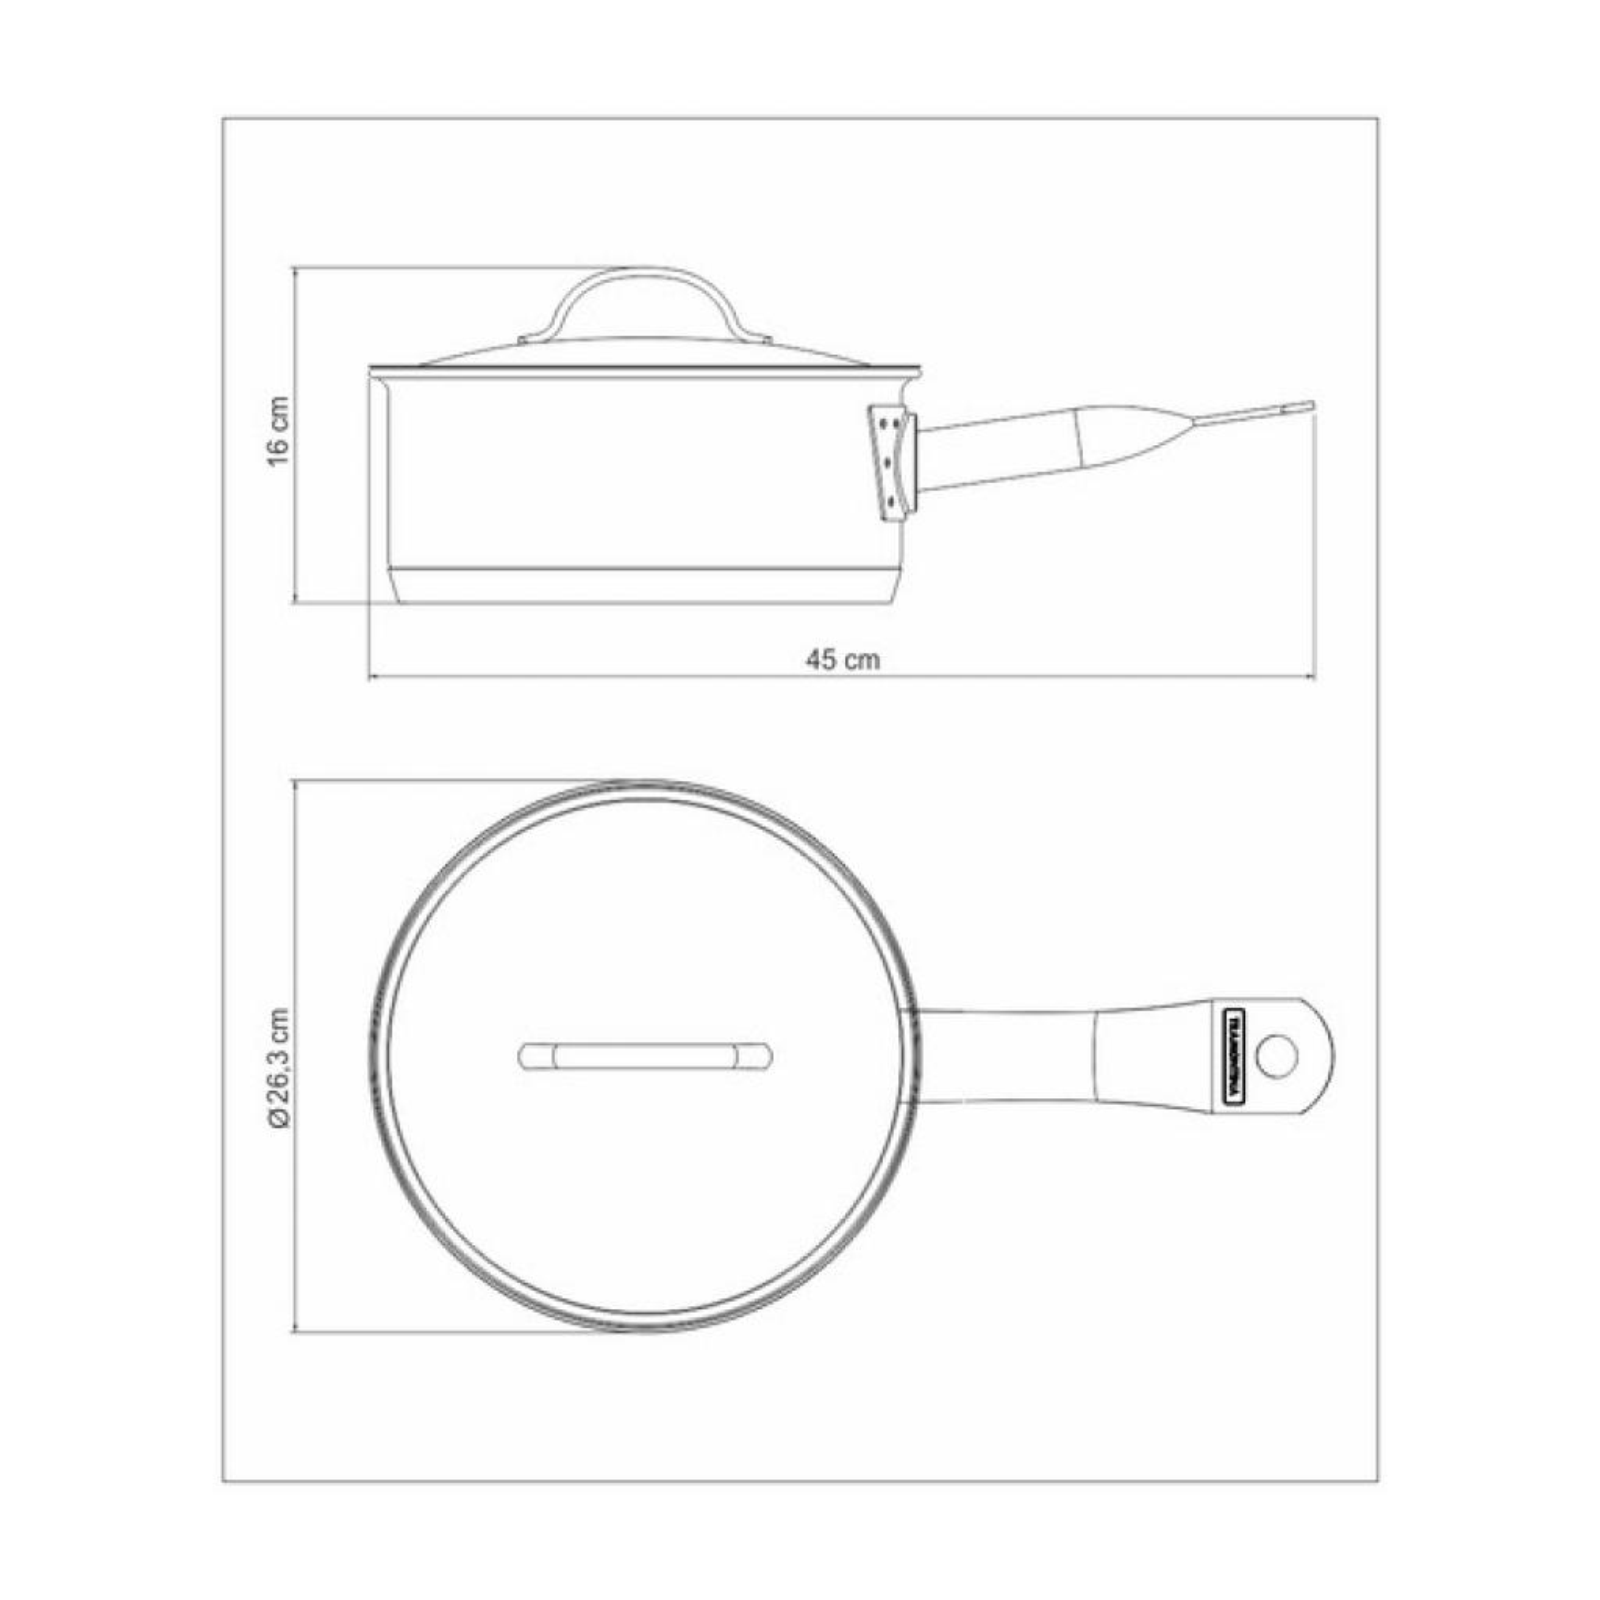 Ковш Tramontina Professional 2.2 л (62627/160) изображение 6